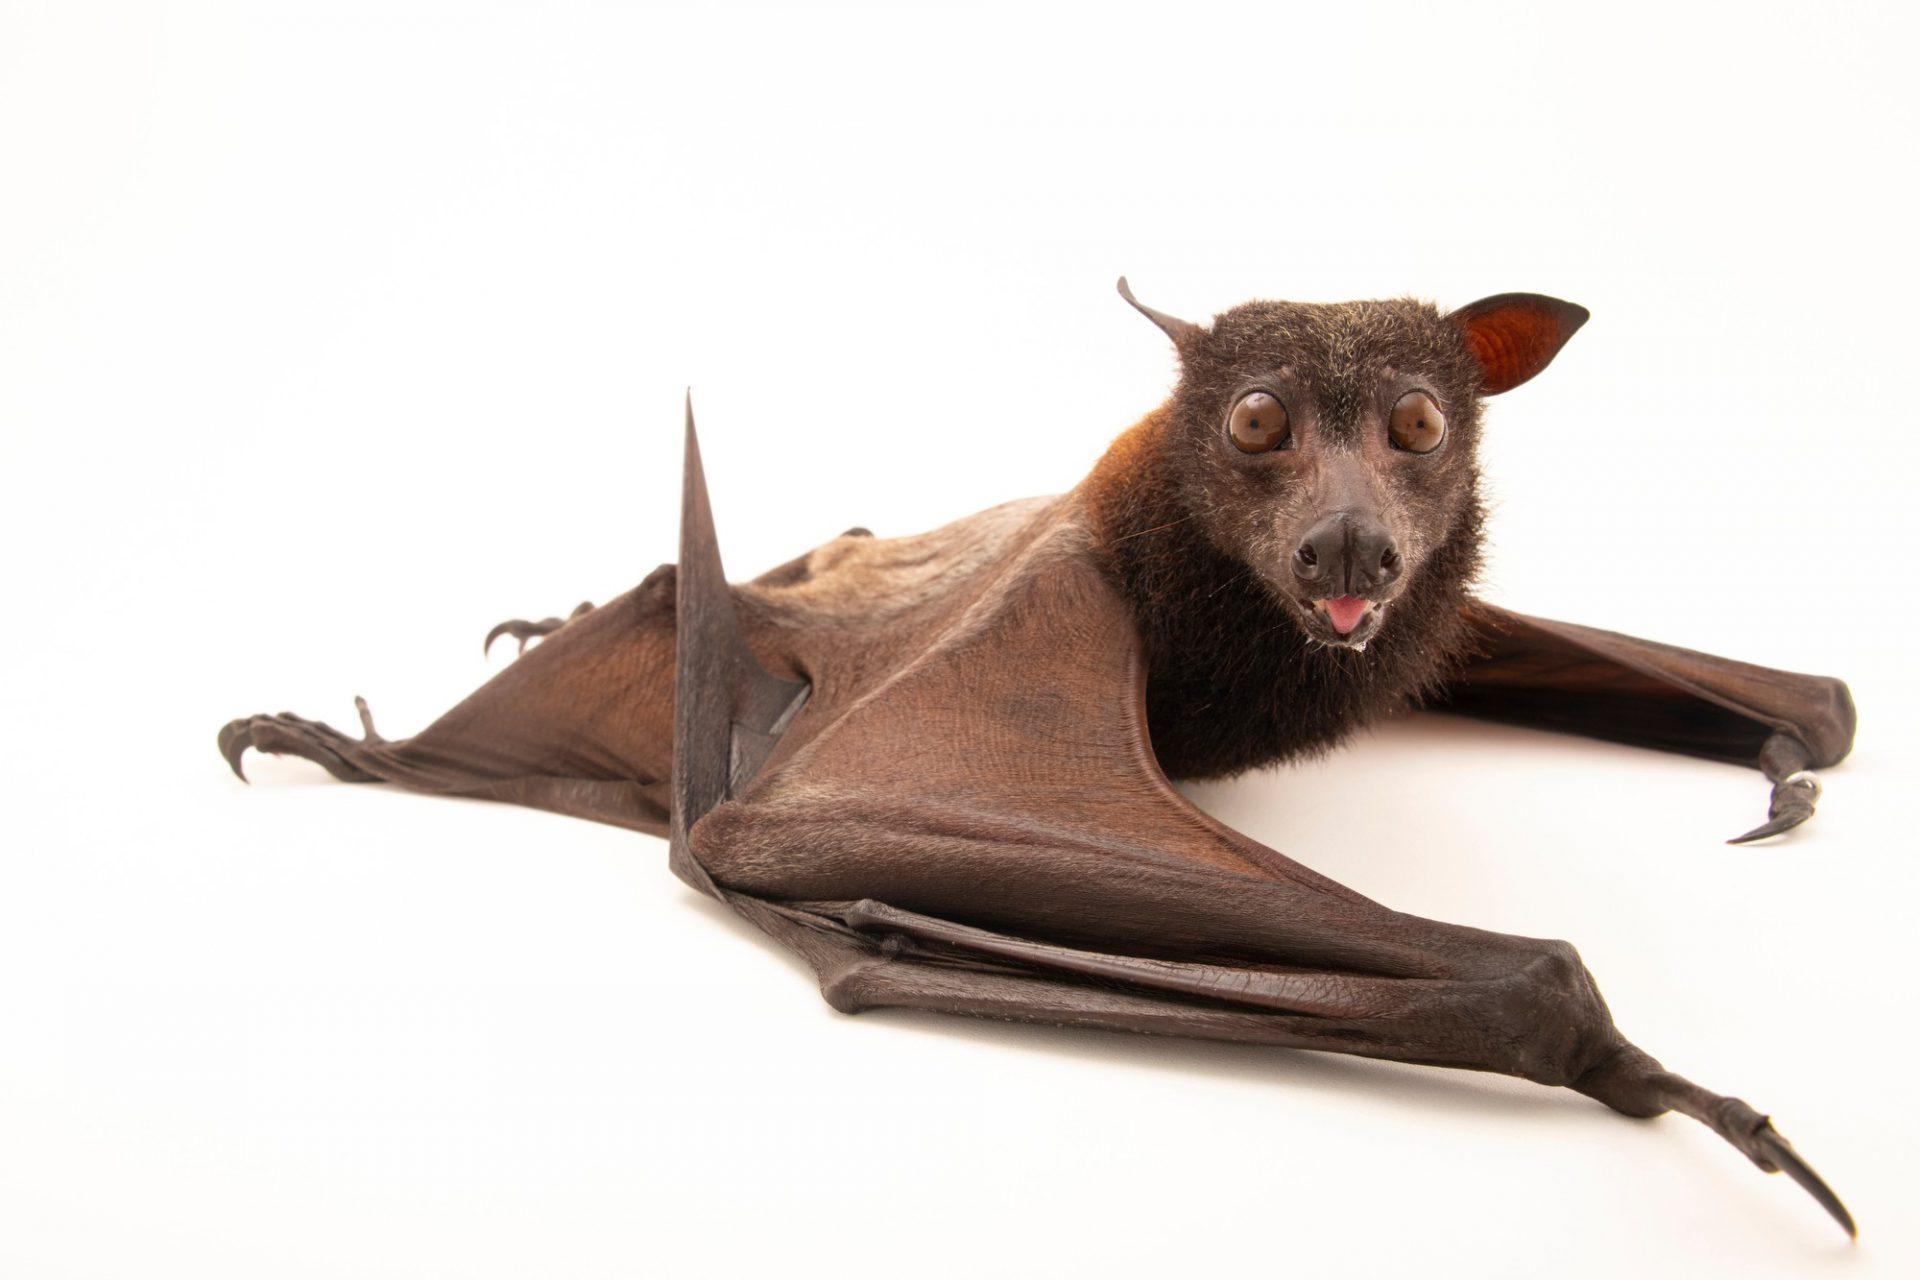 Photo: A Common fruit bat (Pteropus hypomelanus hypomelanus) at Negros Forest Park.